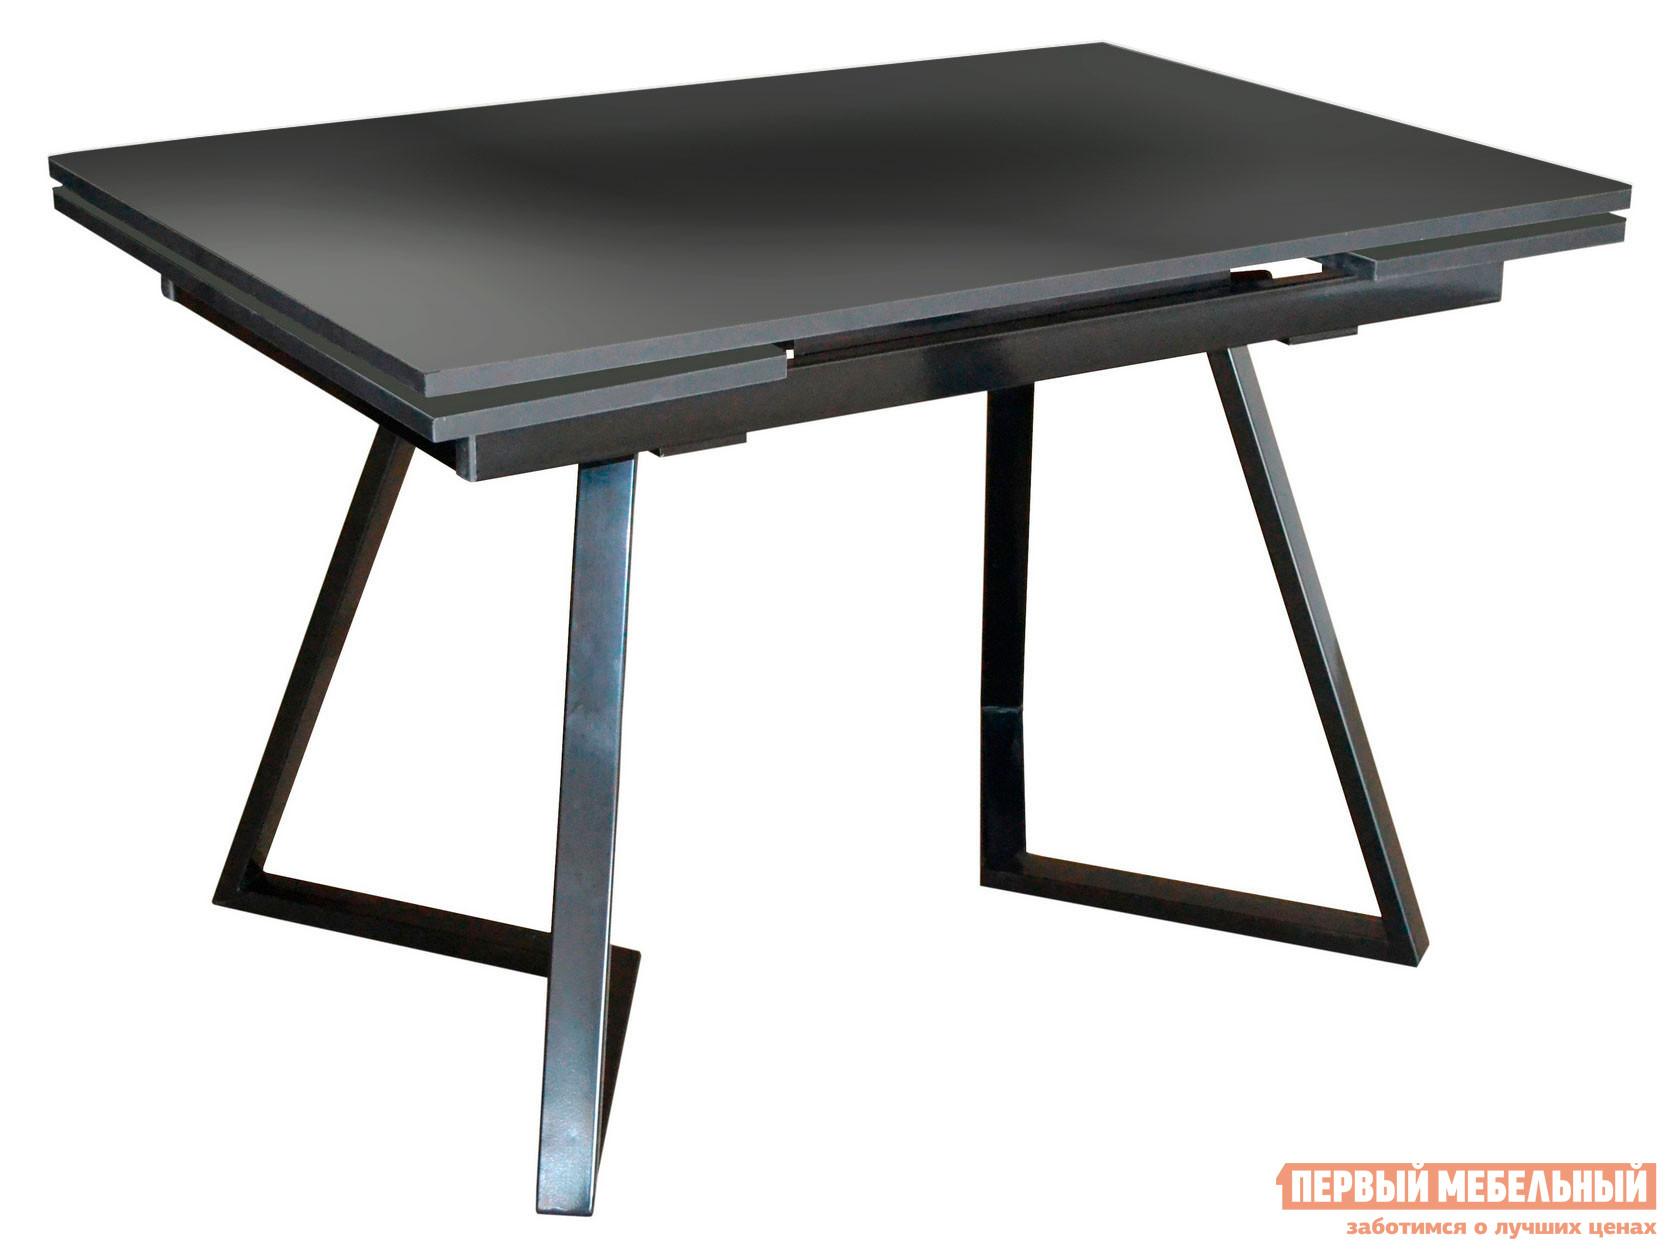 Кухонный стол Линоторг Римини - Стекло